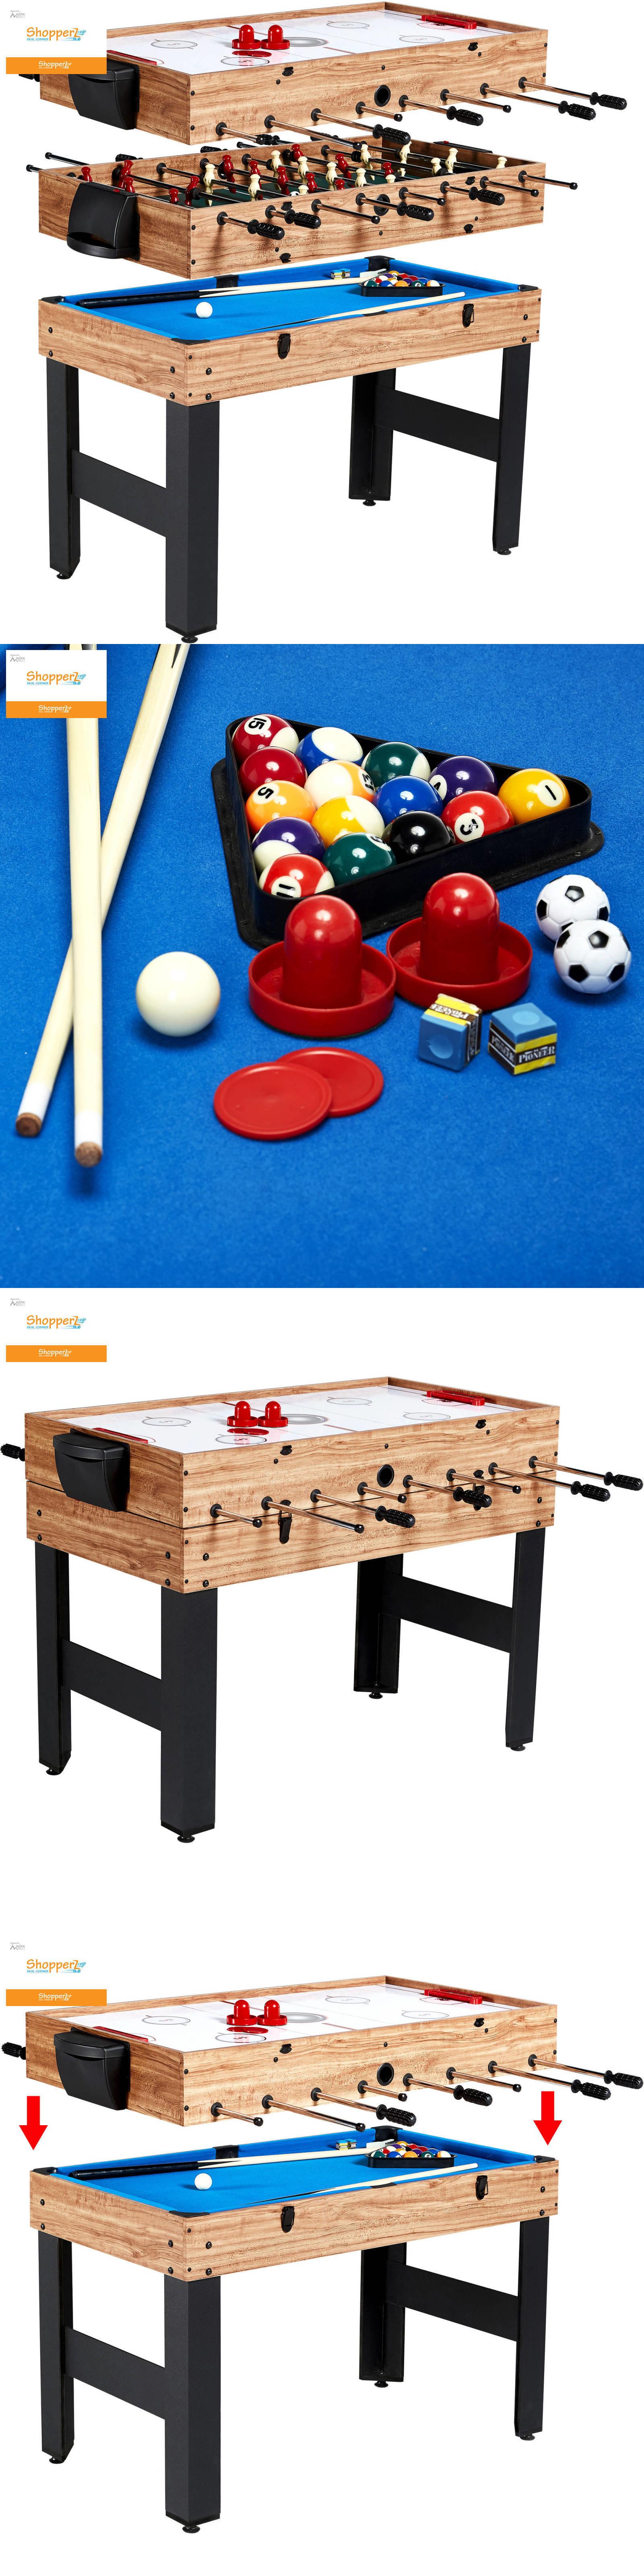 Tables 97075: 3 In 1 Multi Game Table Combo Foosball Pool Billiards Air  Hockey Soccer